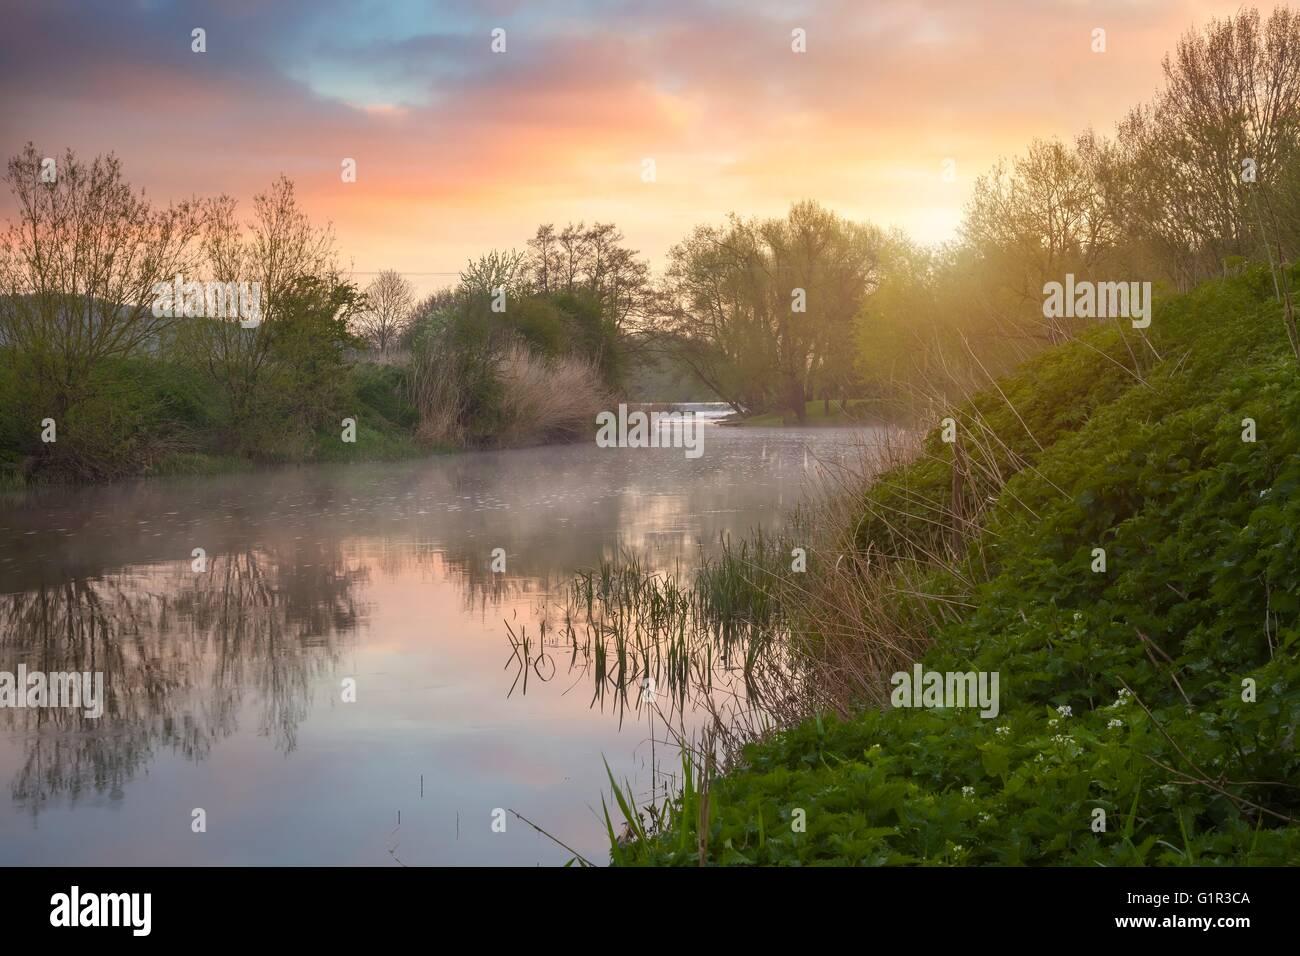 River Avon at dawn, Welford on Avon, Warwickshire, England - Stock Image